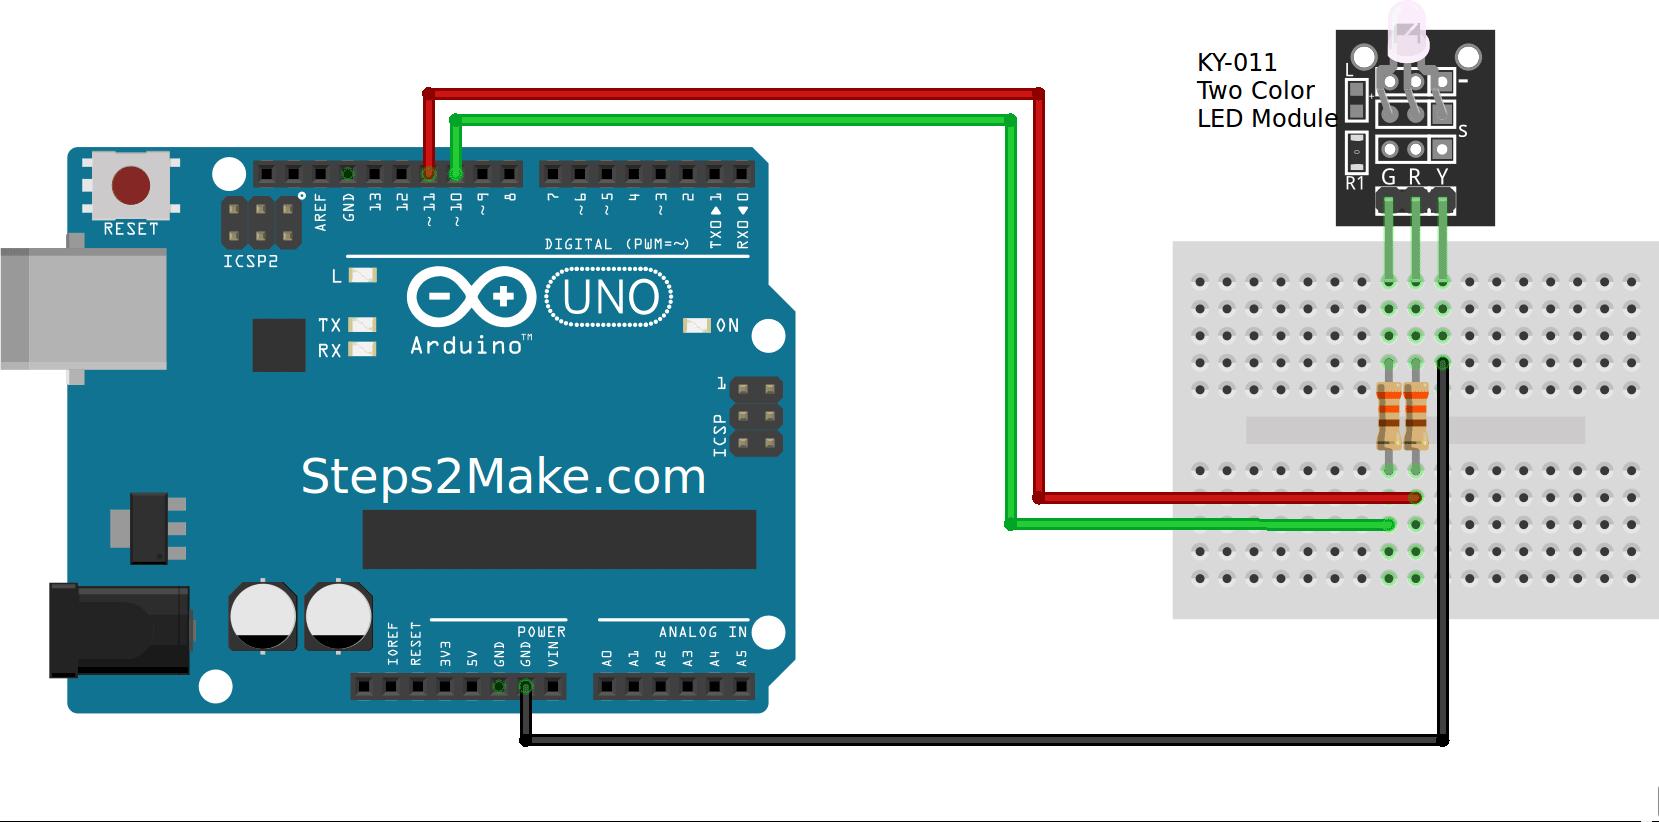 Arduino color led module ky steps make